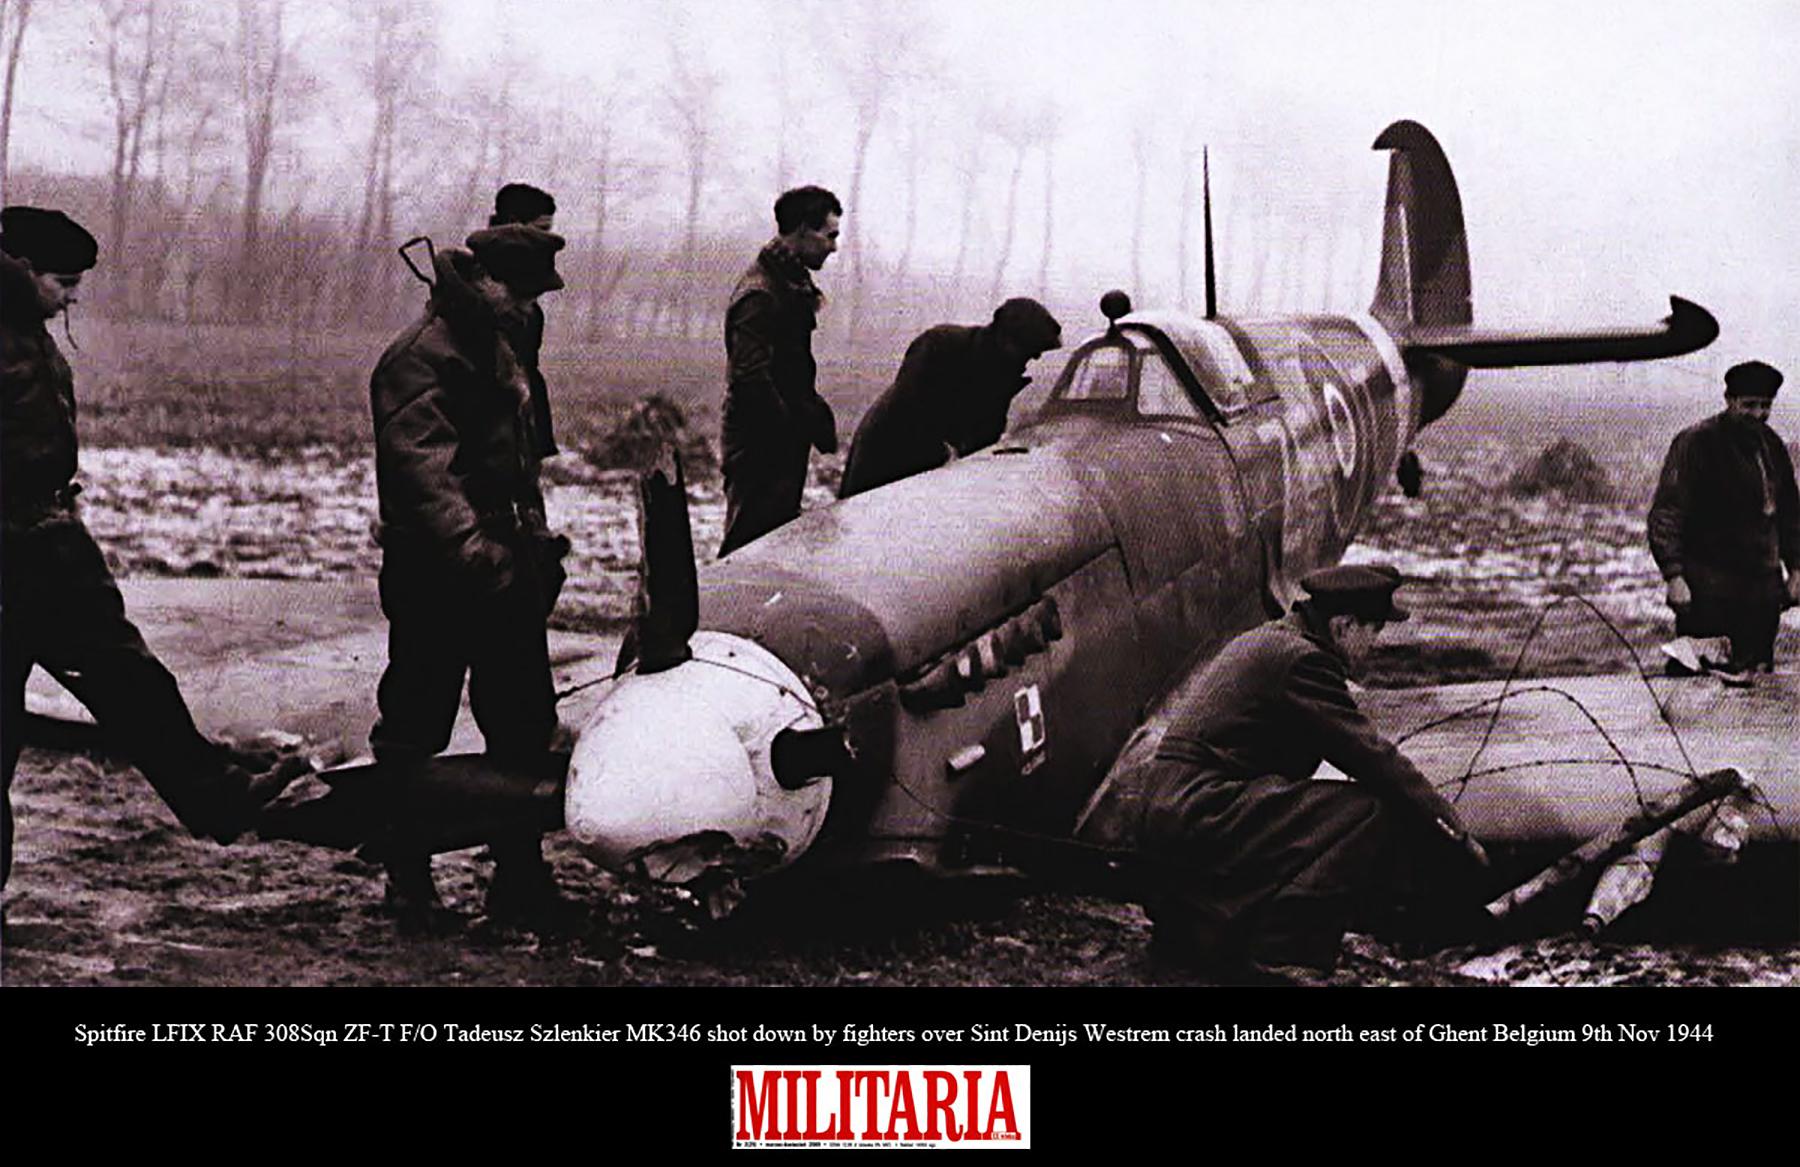 Spitfire LFIX RAF 308Sqn ZFT Tadeusz Szlenkier MK346 shot down by fighters Ghent Belgium 9th Nov 1944 01